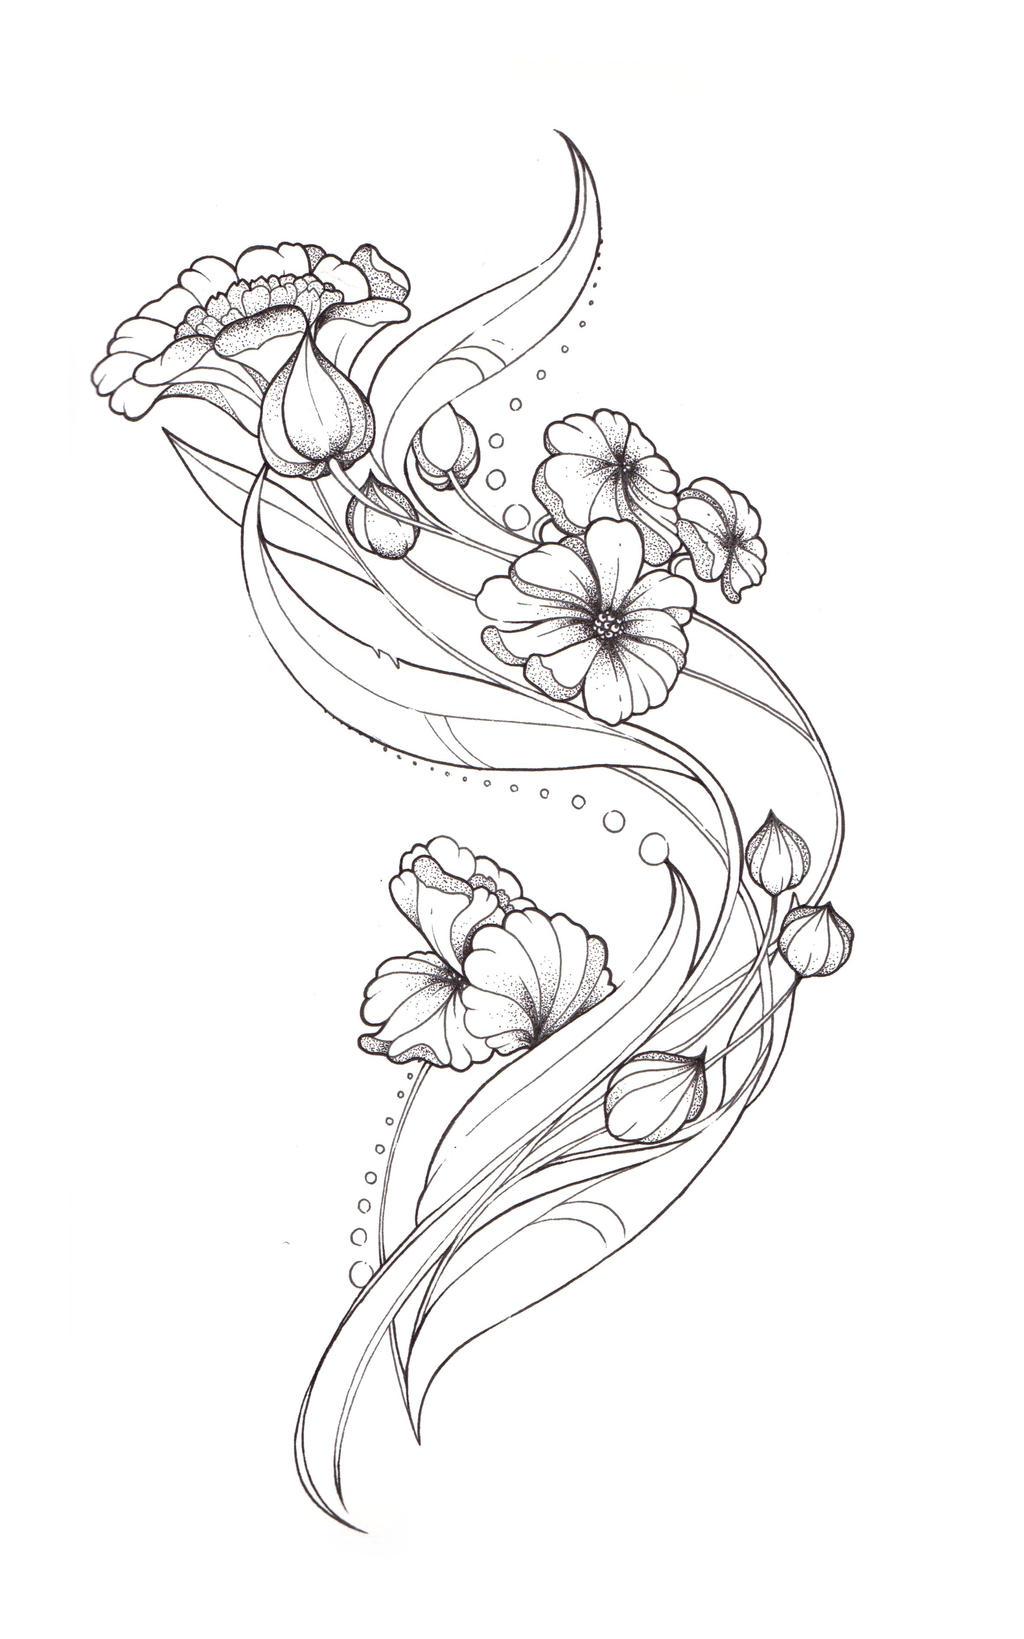 art nouveau tattoo design by tegan ray on deviantart. Black Bedroom Furniture Sets. Home Design Ideas